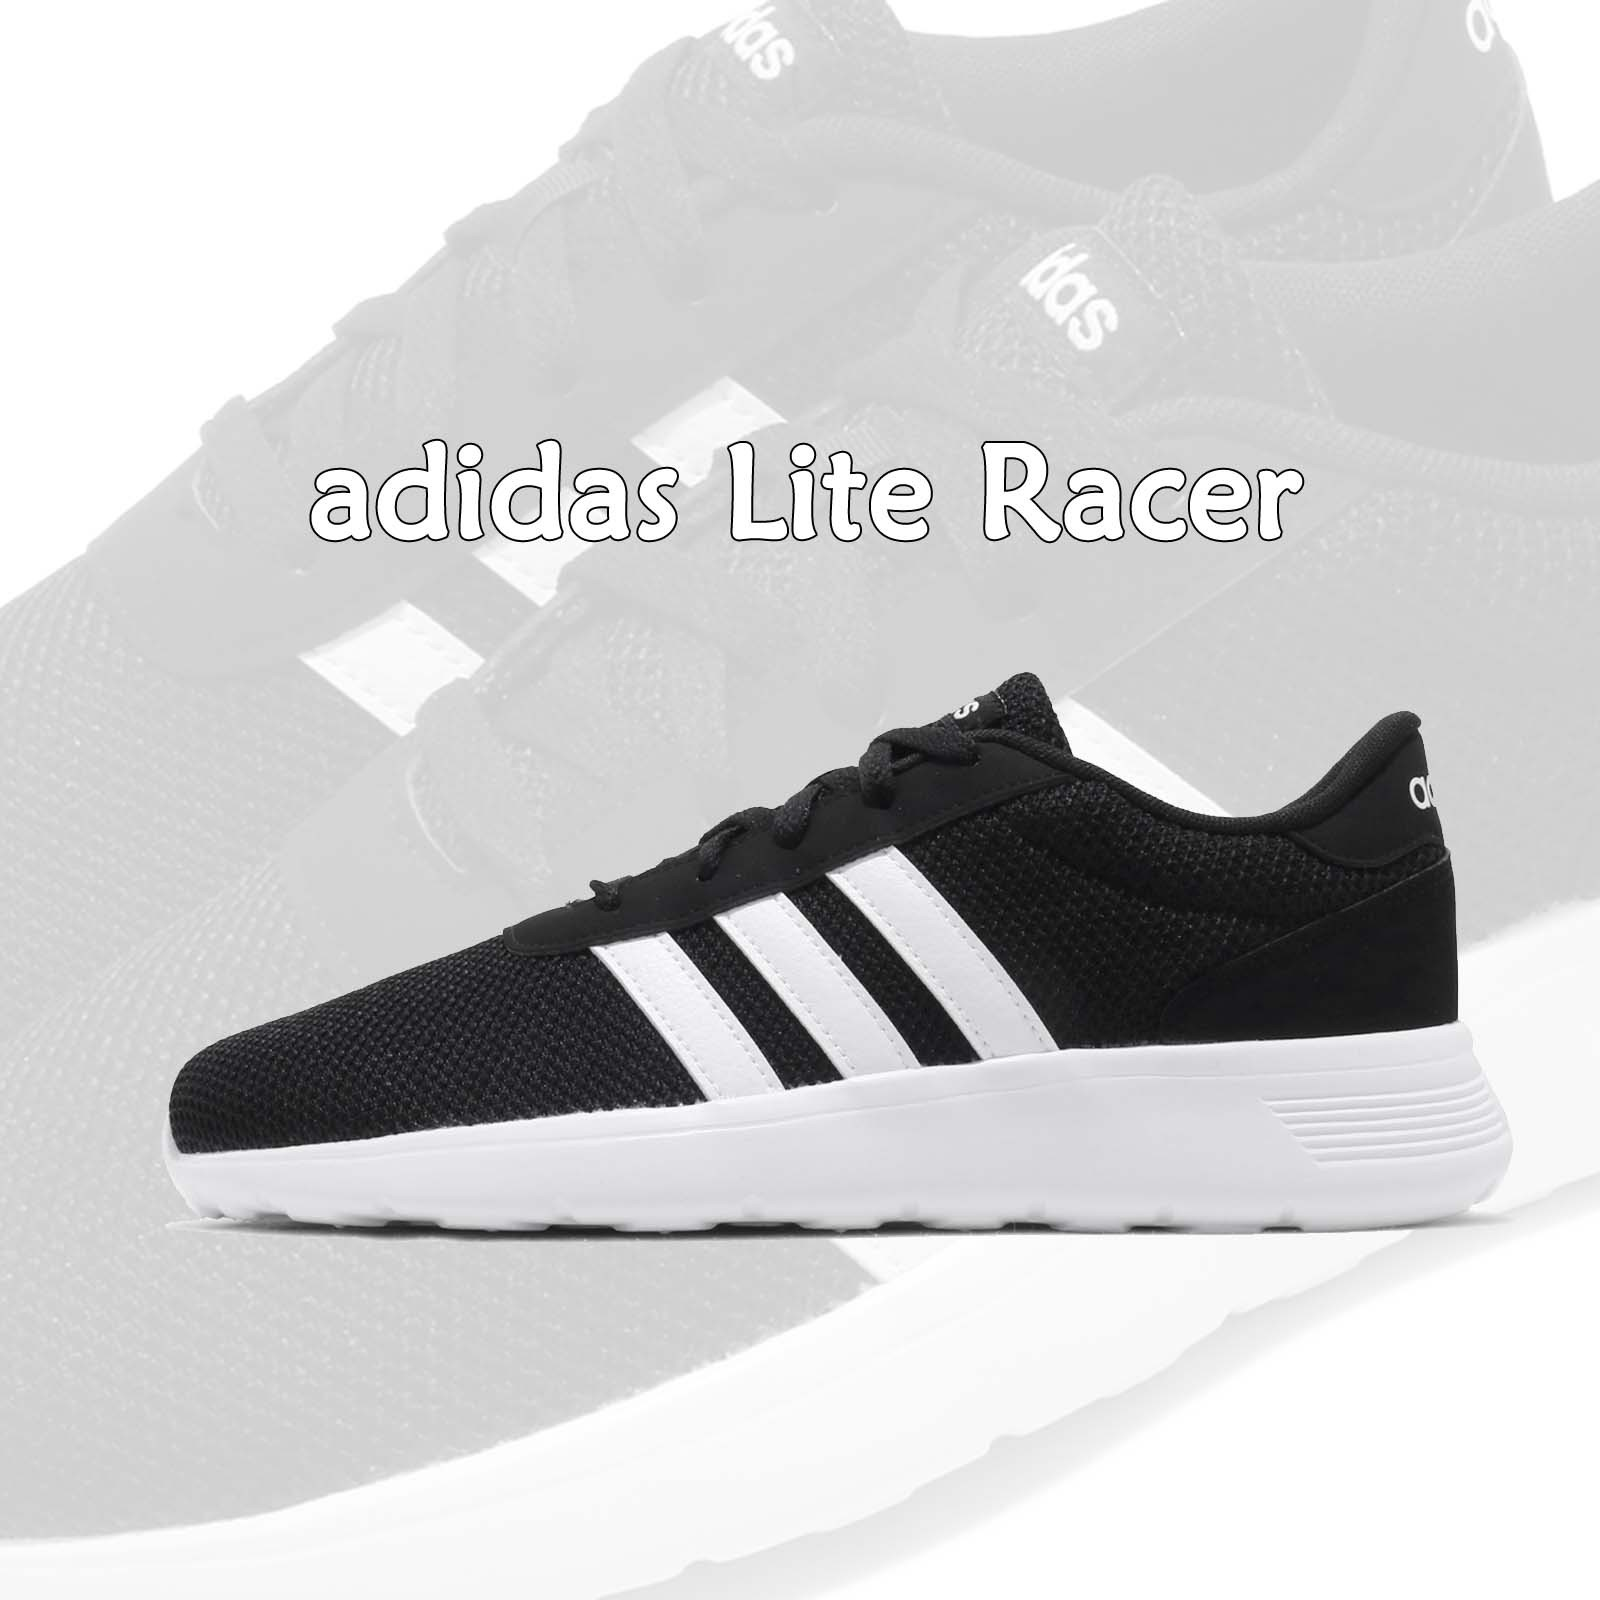 adidas 休閒鞋 Lite Racer 黑 白 三條線 男鞋 基本款 運動鞋 愛迪達【ACS】 EH1323